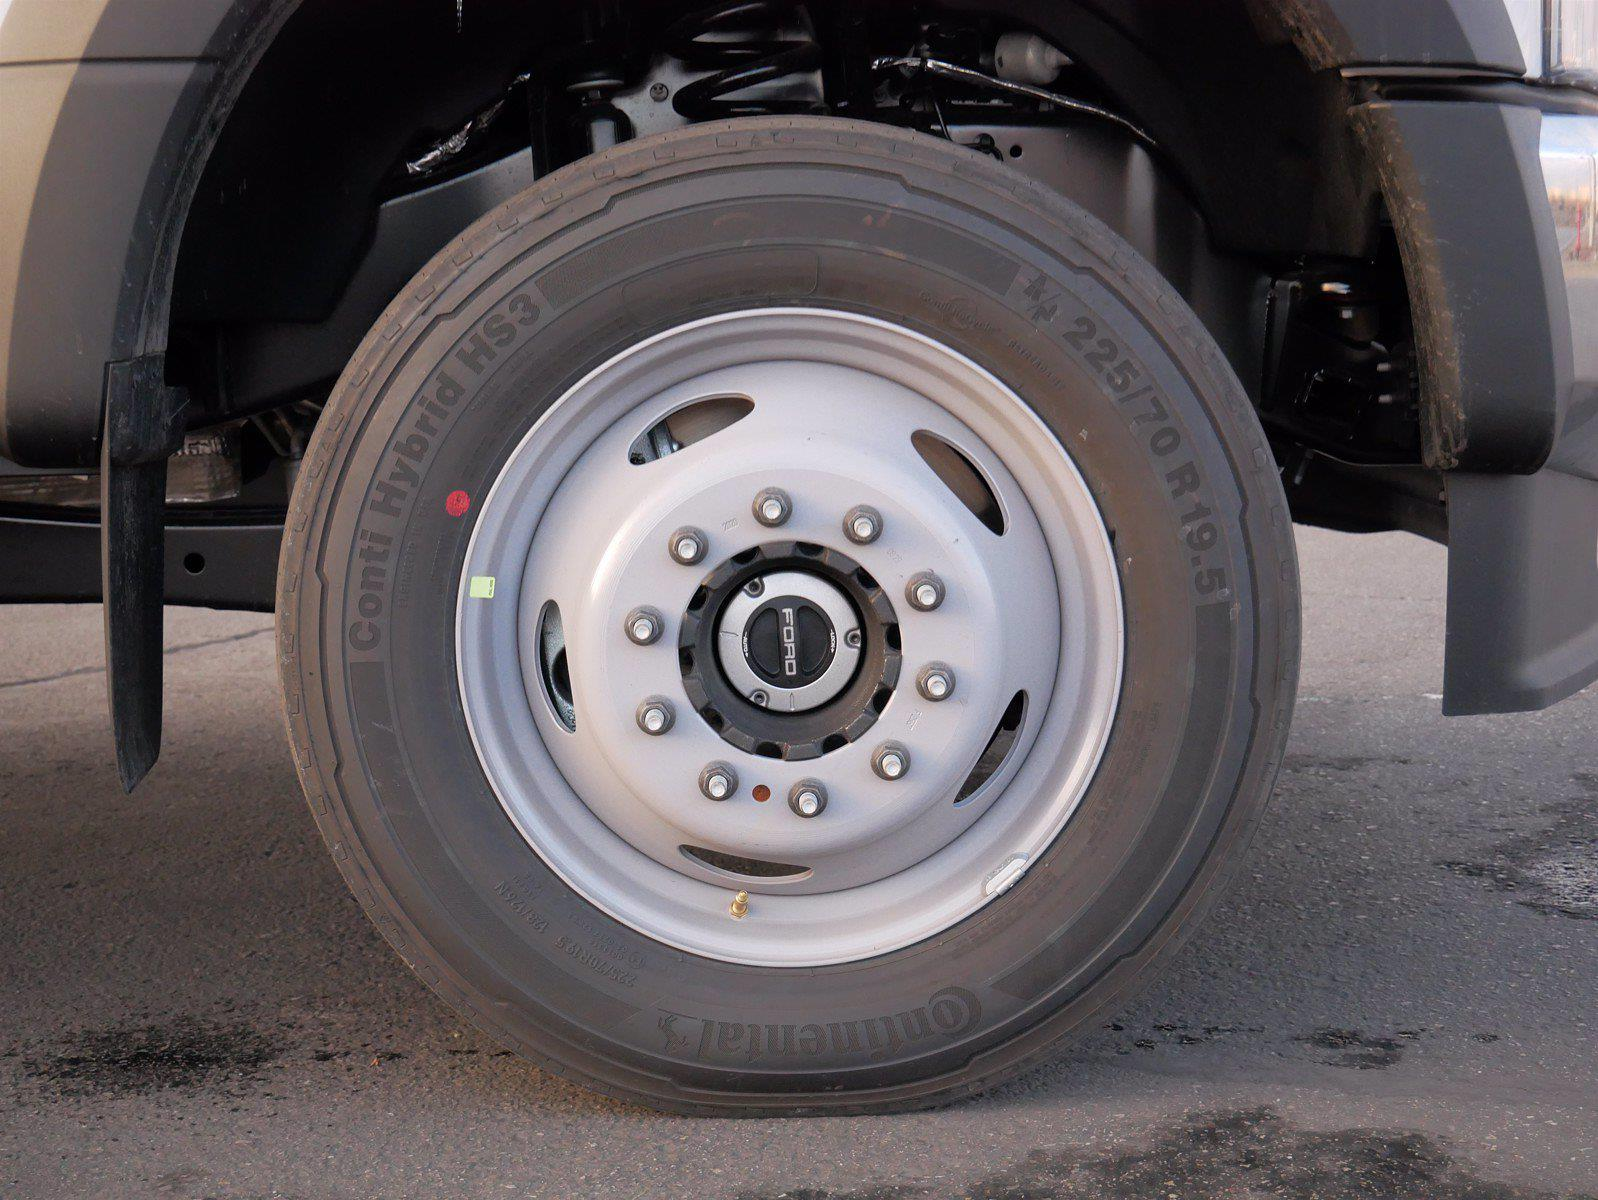 2021 Ford F-550 Regular Cab DRW 4x4, Scelzi Dump Body #64096 - photo 25